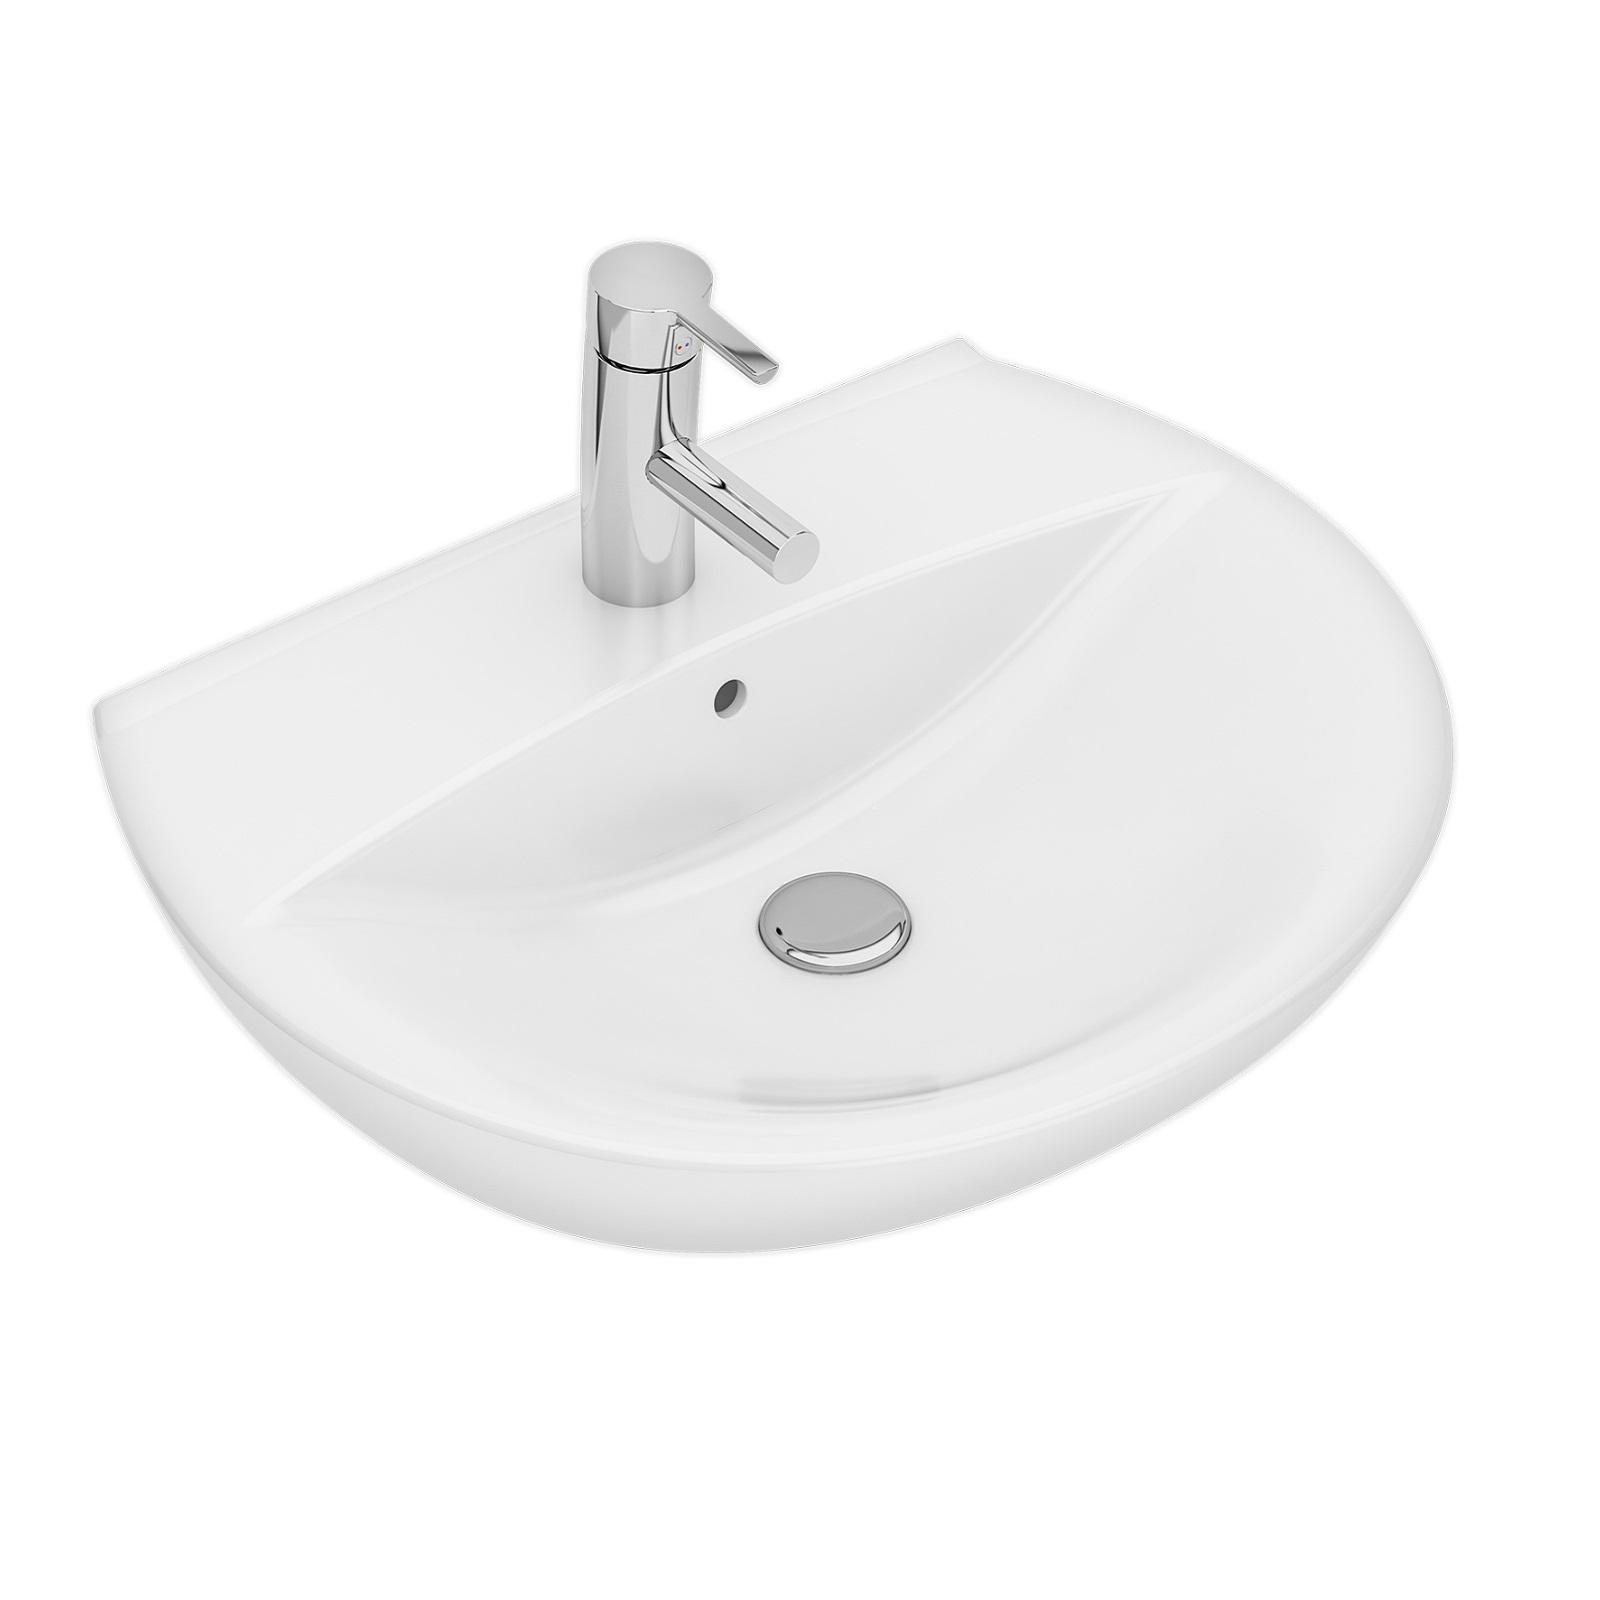 Tvättställ Ifö Spira 15162 60 cm